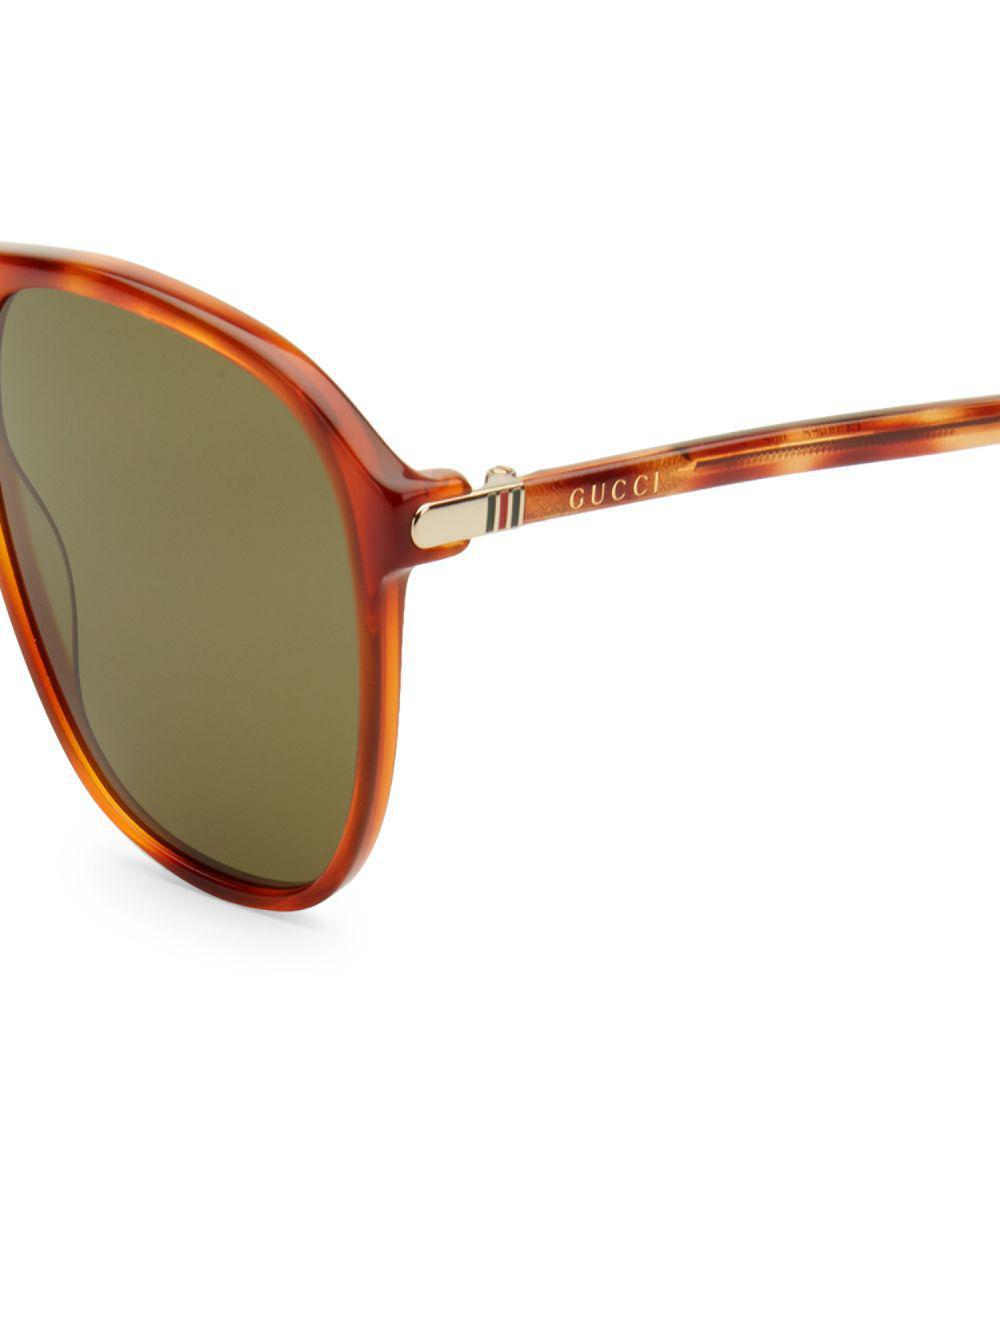 9b821263d Gucci Tortoiseshell 56mm Square Sunglasses - Lyst